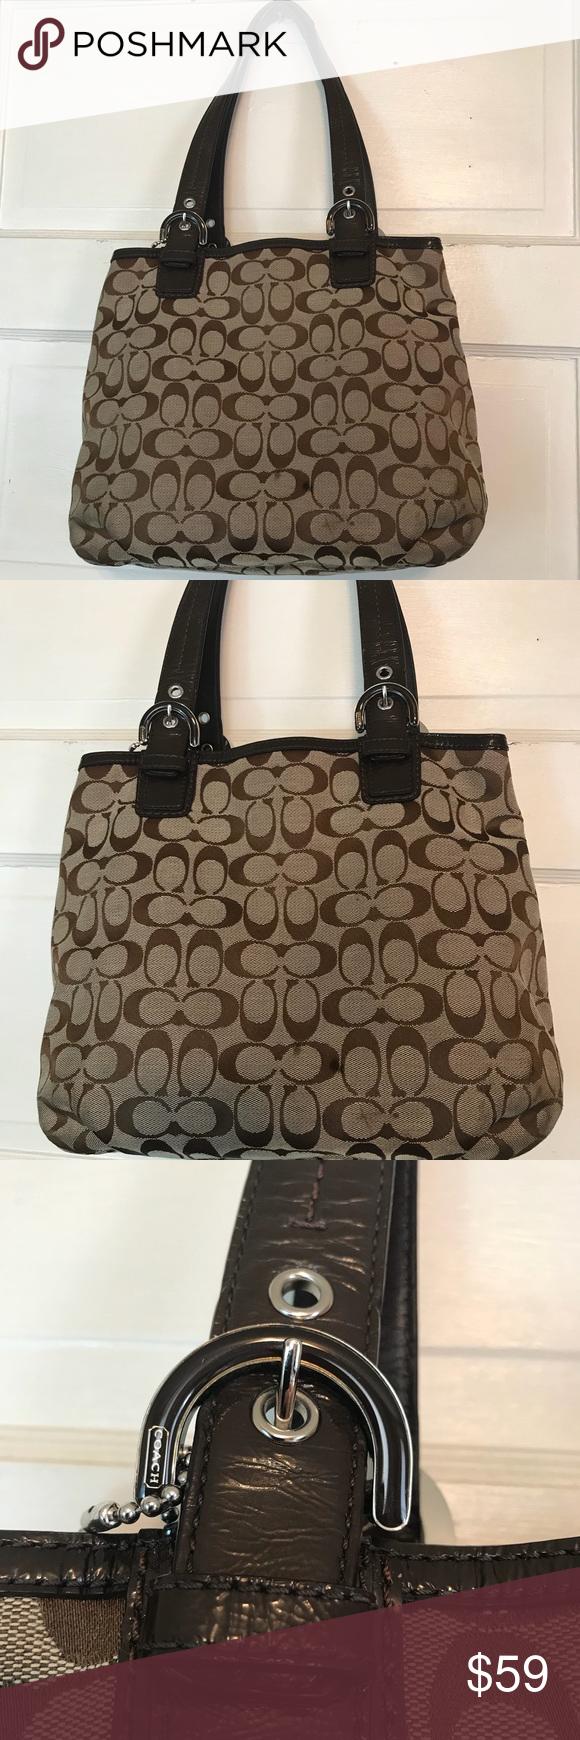 Coach Soho Brown Shoulder Bag RARE Purse Handbag Coach Sogo